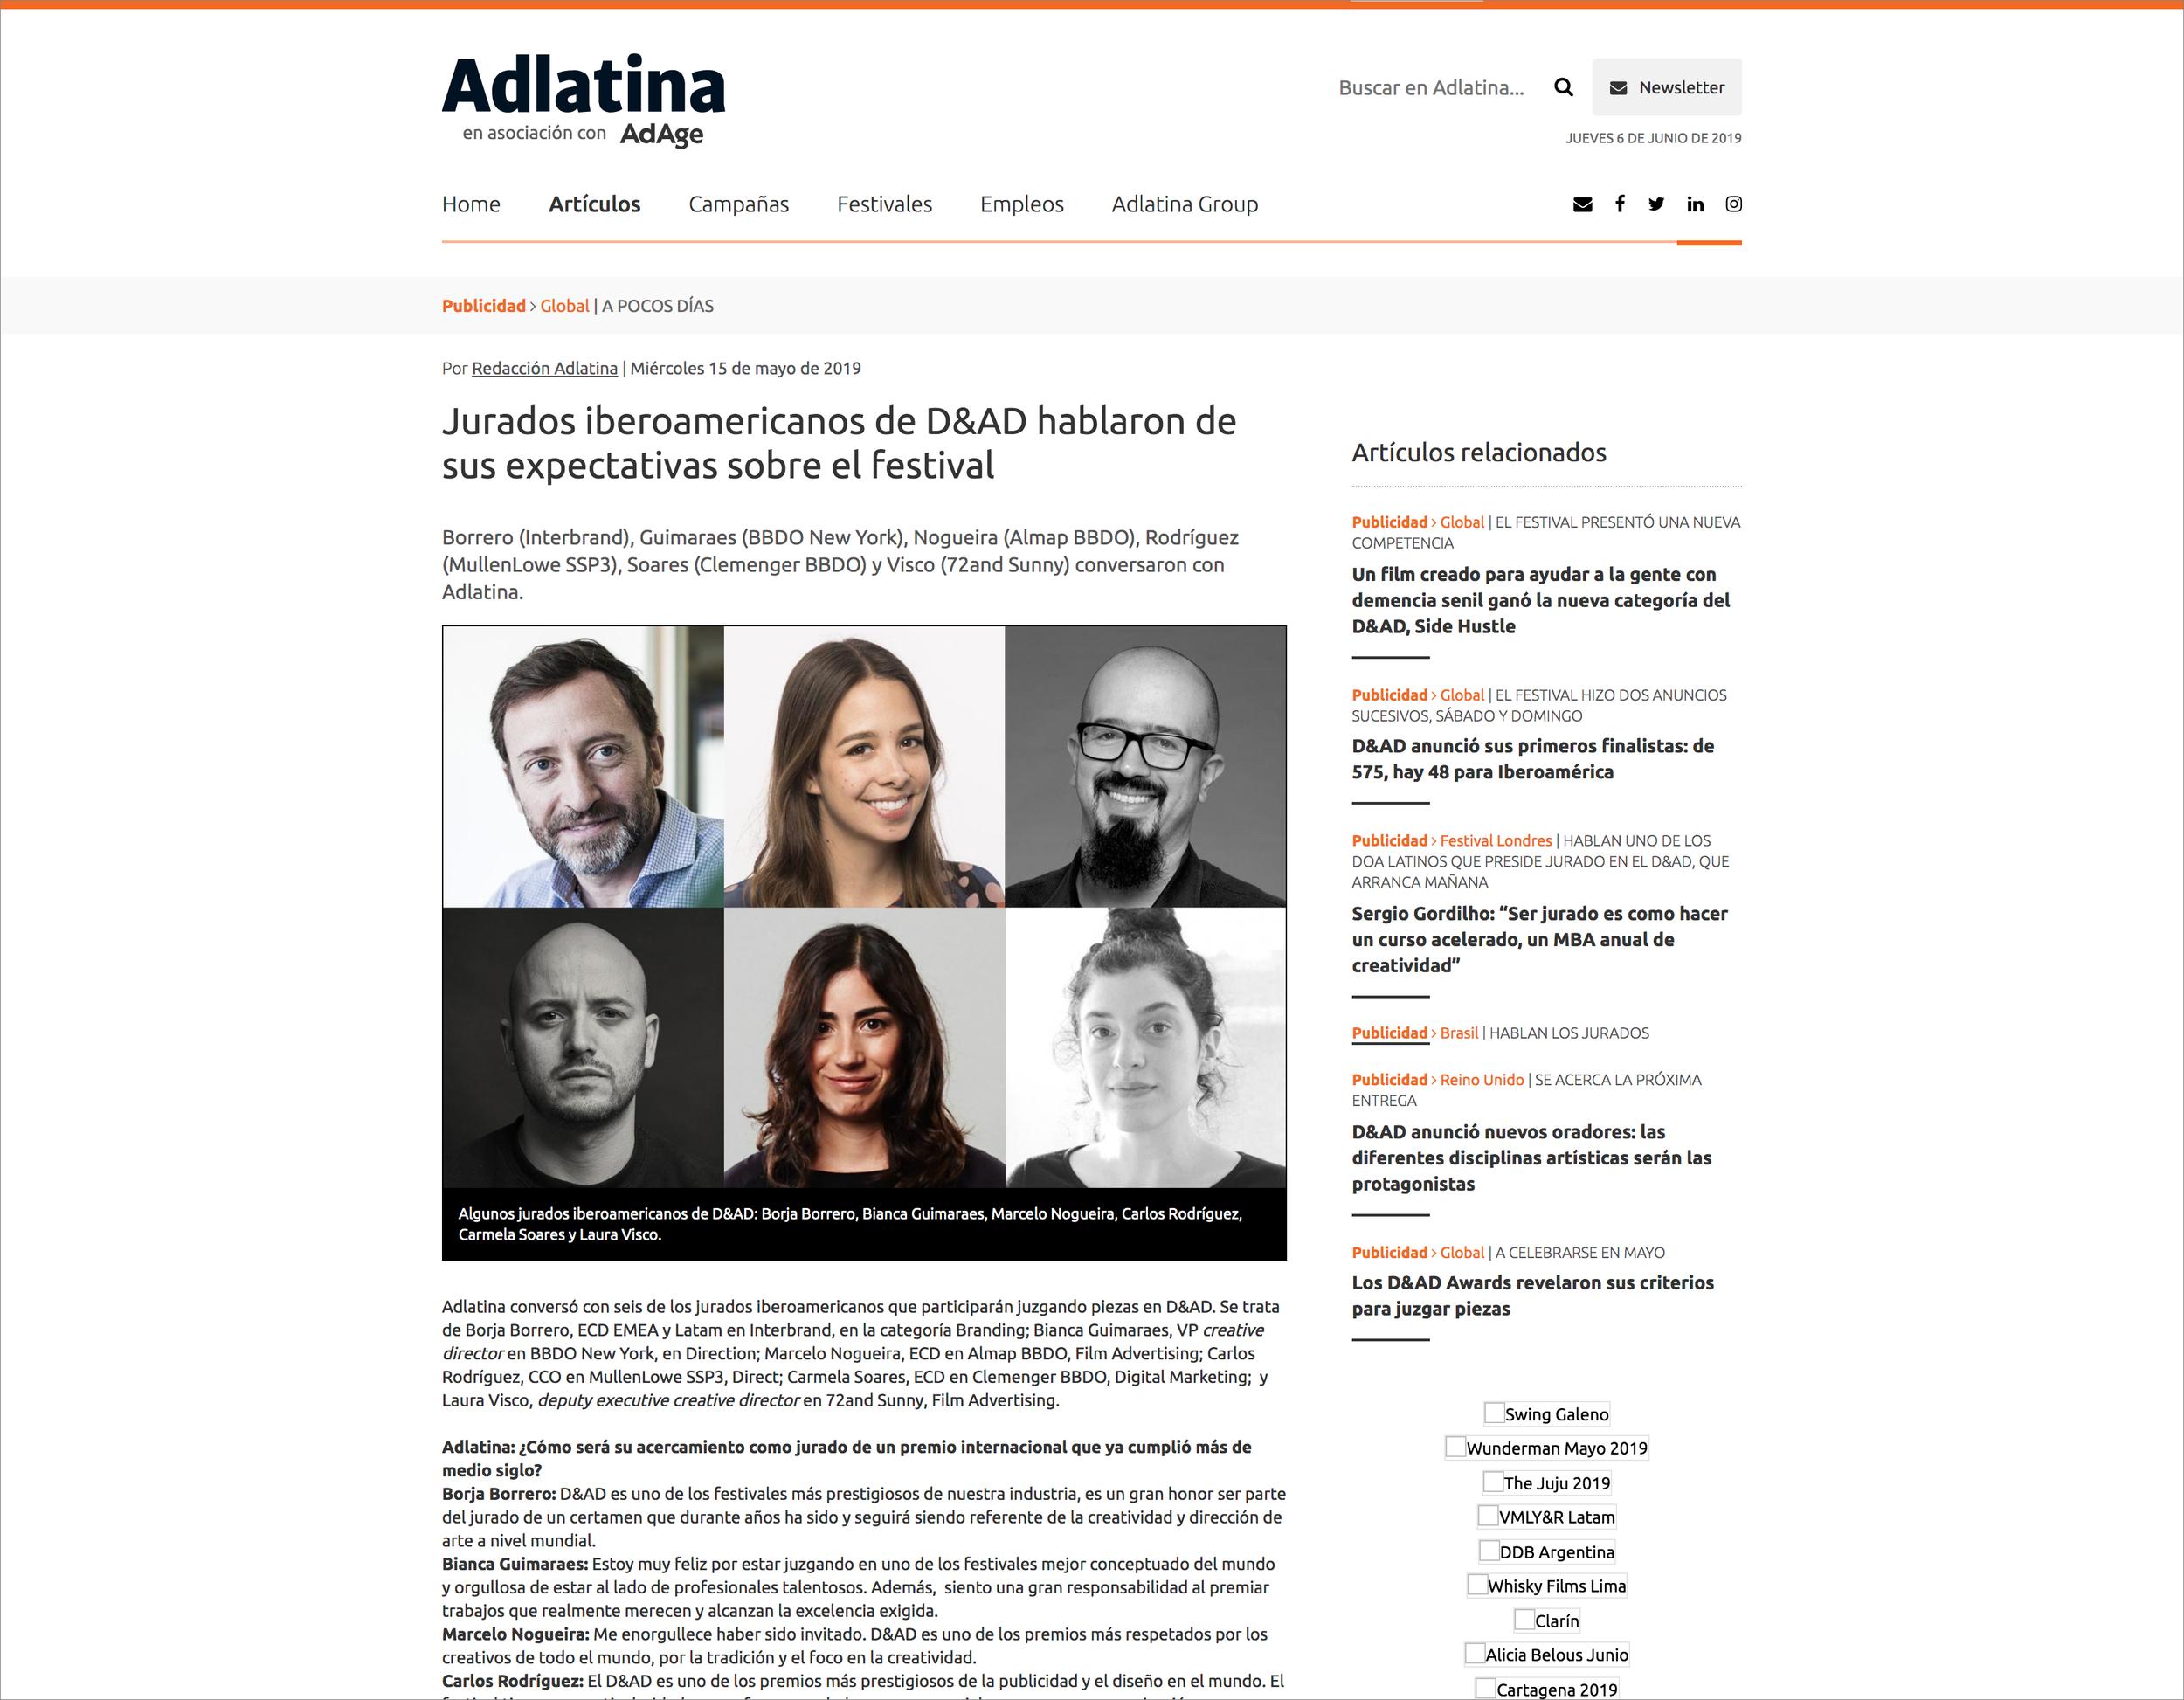 screencapture-adlatina-publicidad-jurados-iberoamericanos-de-d-2019-06-06-16_43_30.png